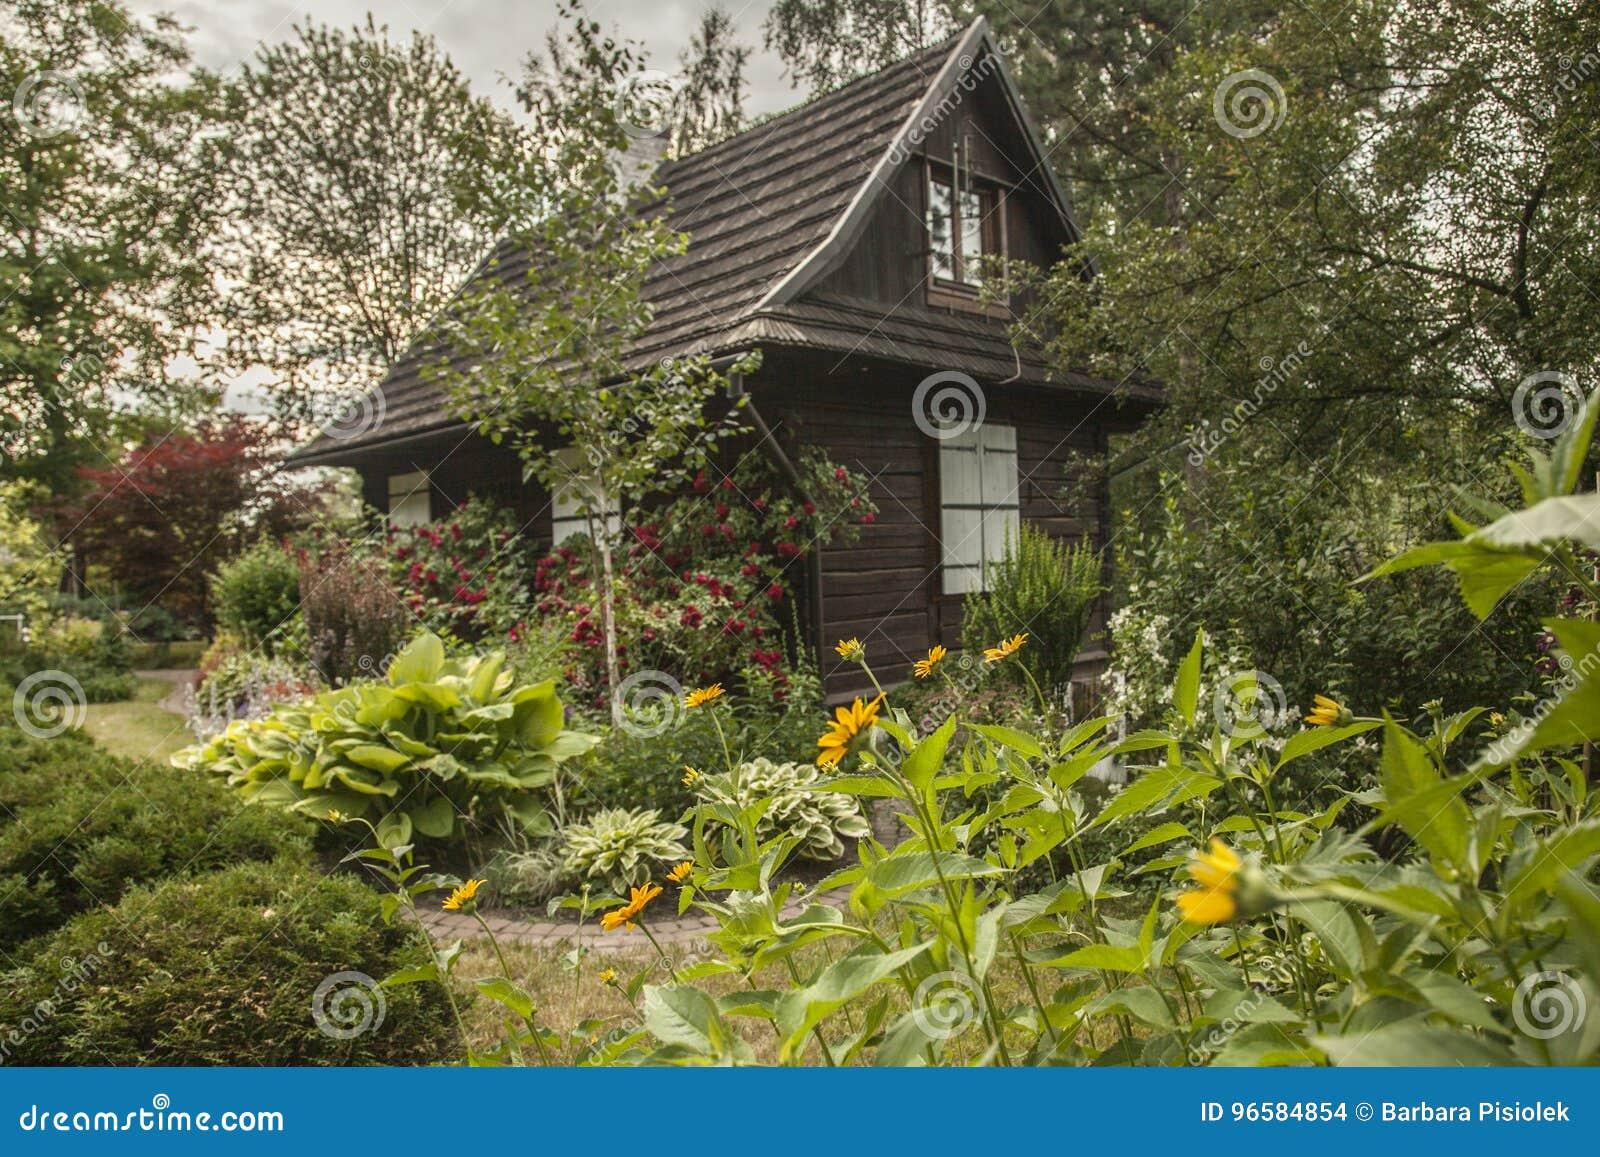 Kazimierz Dolny, Poland - An Old House In A Garden. Stock Photo ...